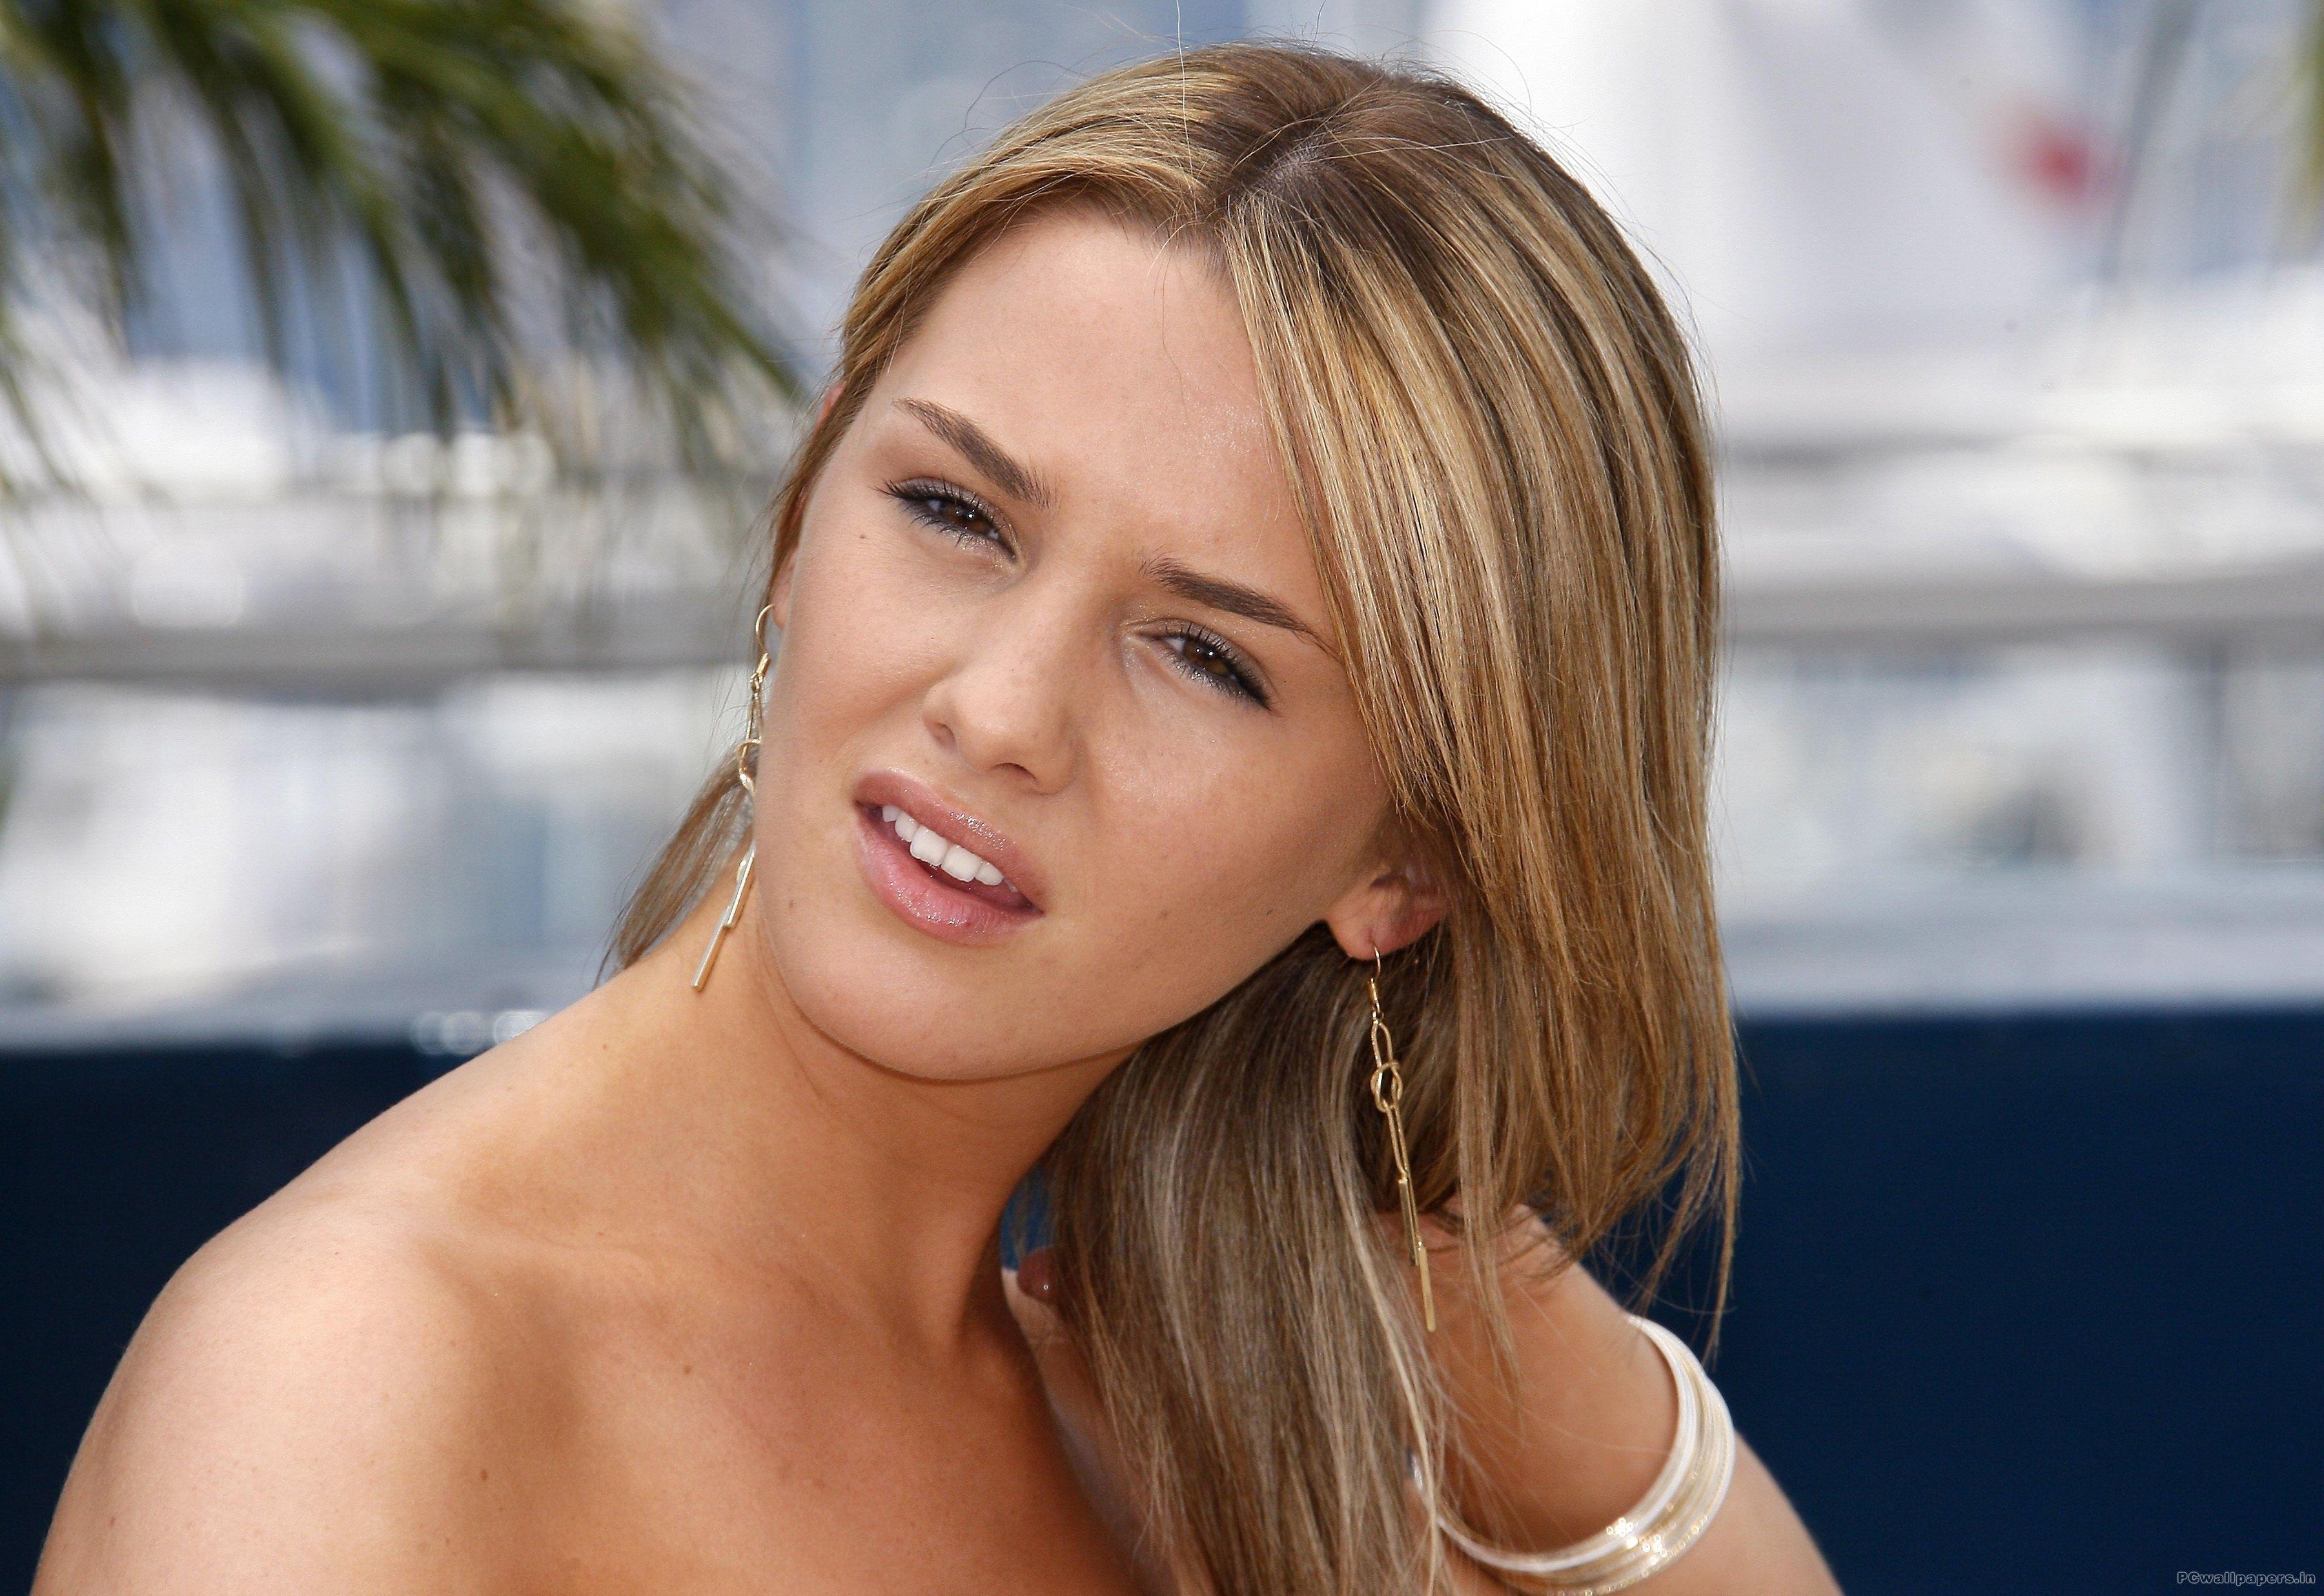 Addison Timlin | Timlin | Pinterest | Addison timlin, Arielle kebbel and Celebrities